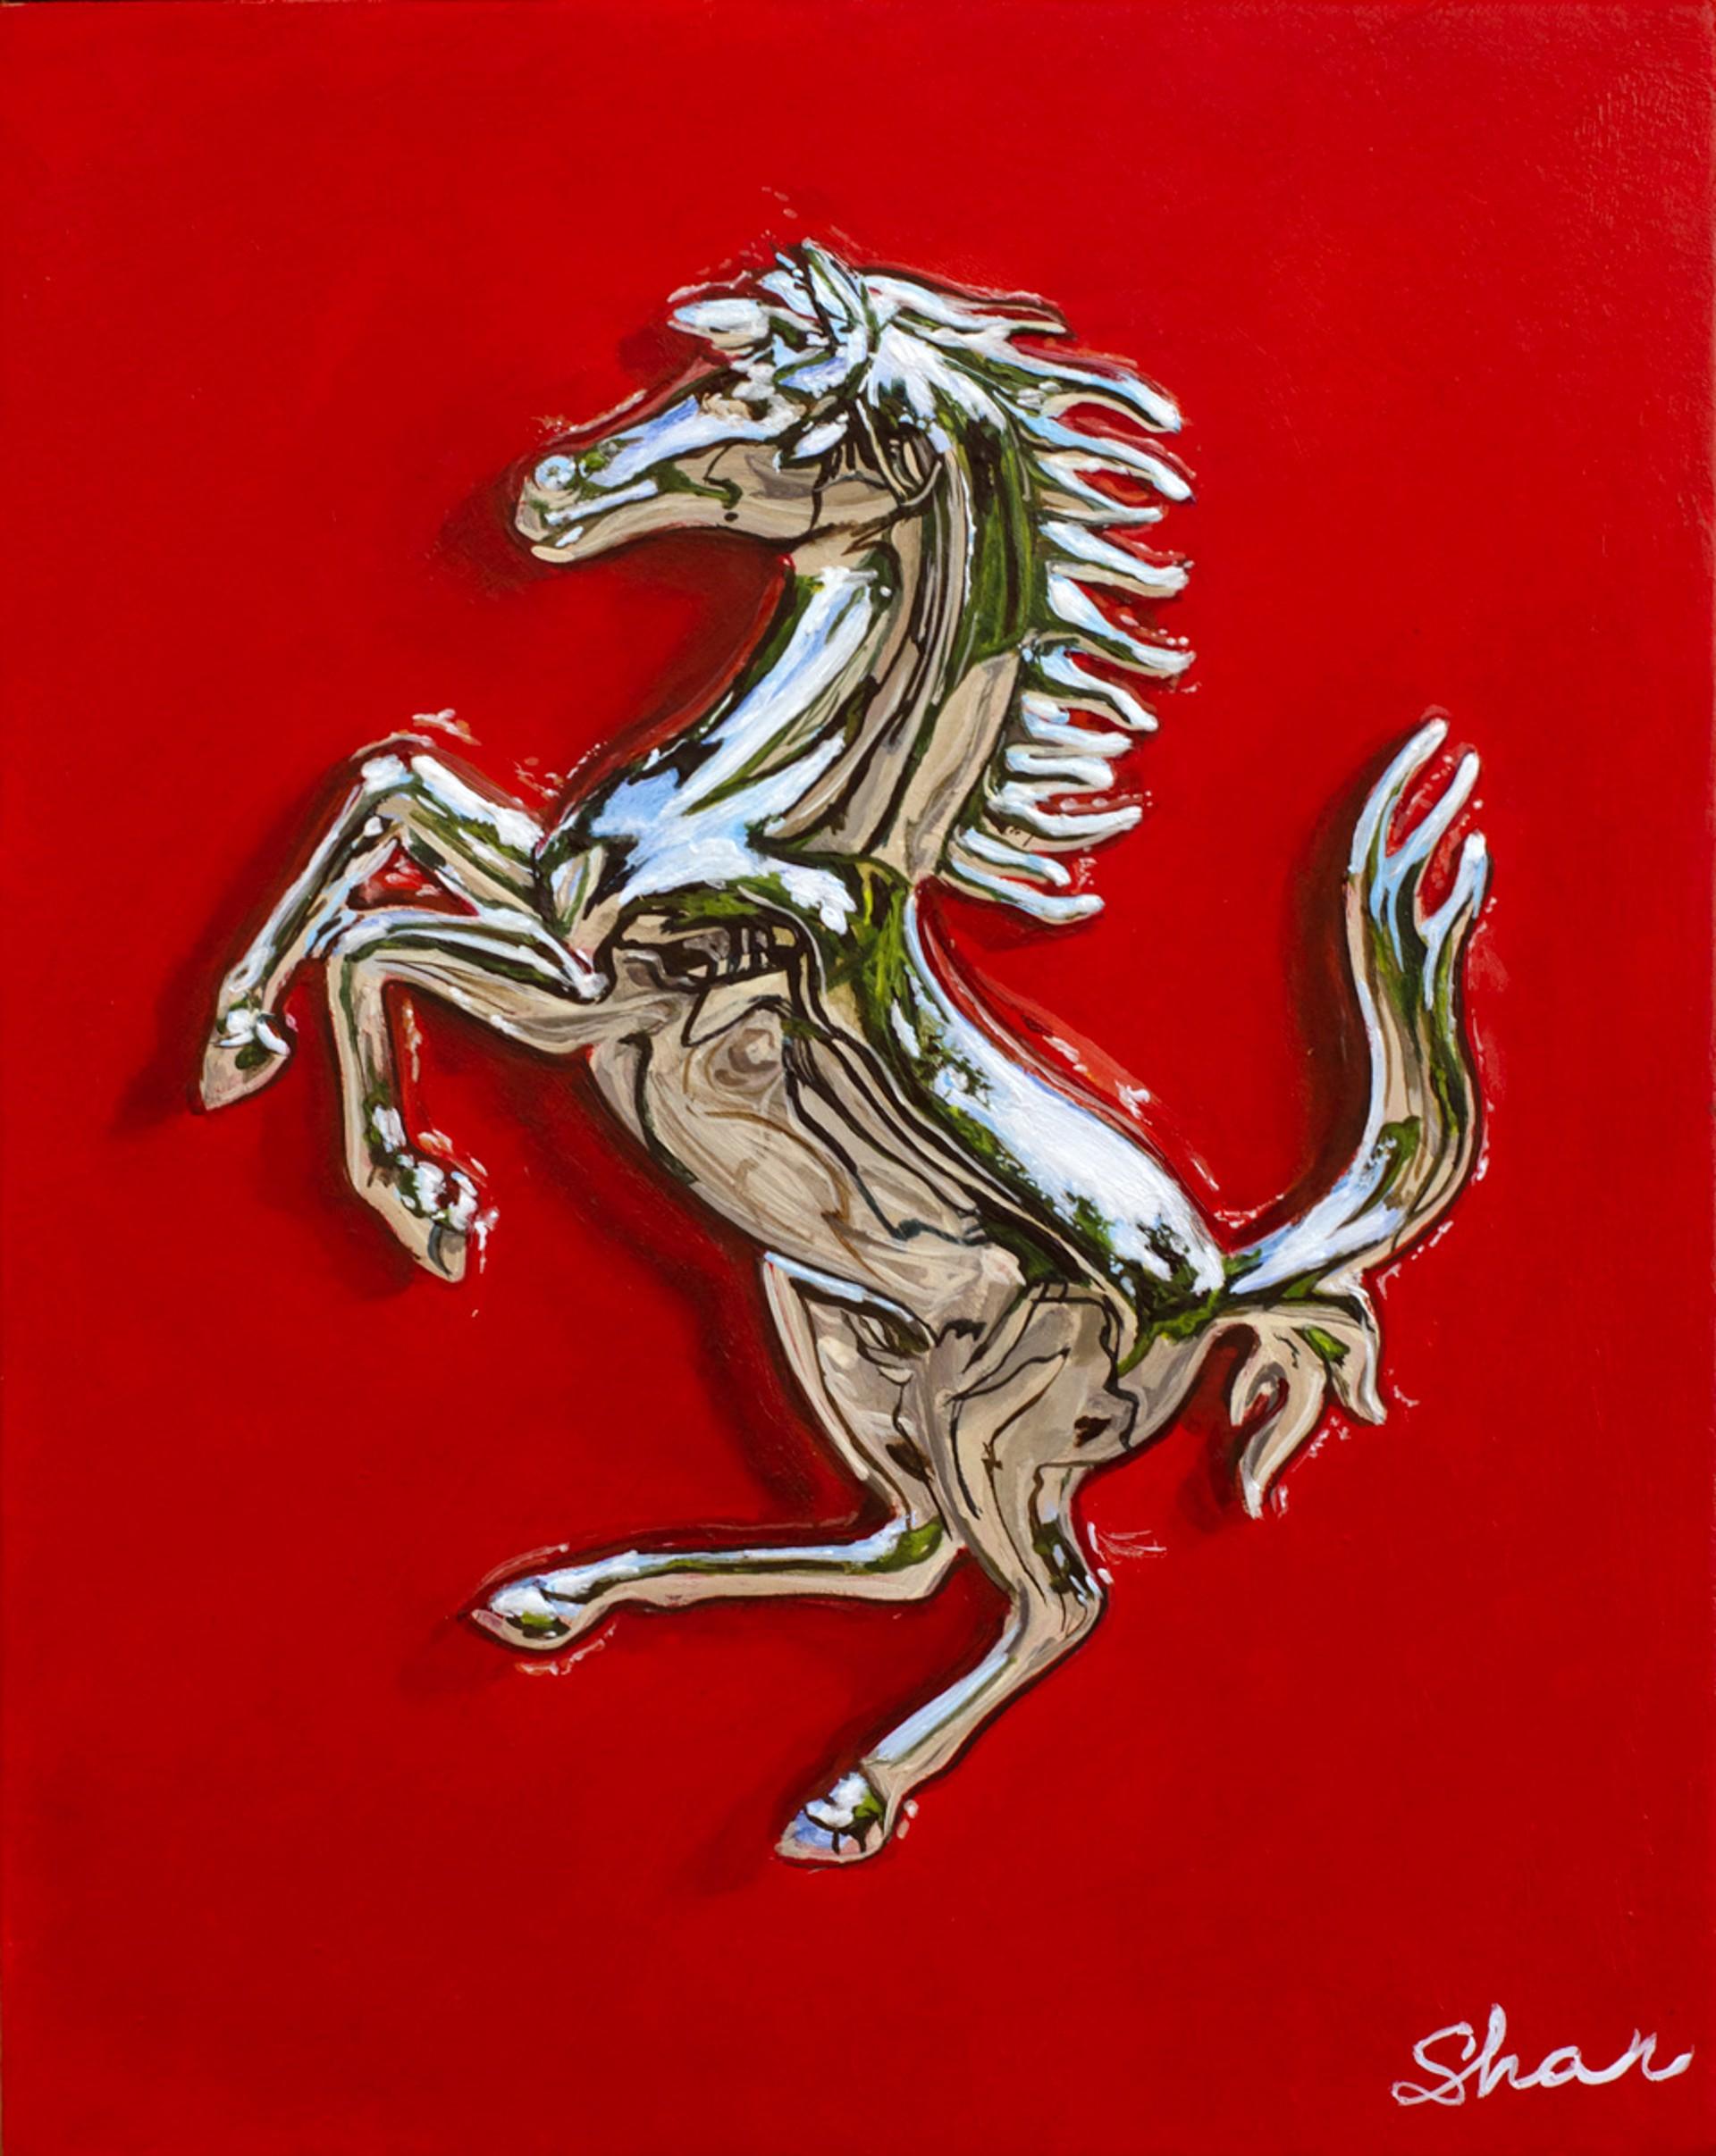 Ferrari Emblem by Shan Fannin